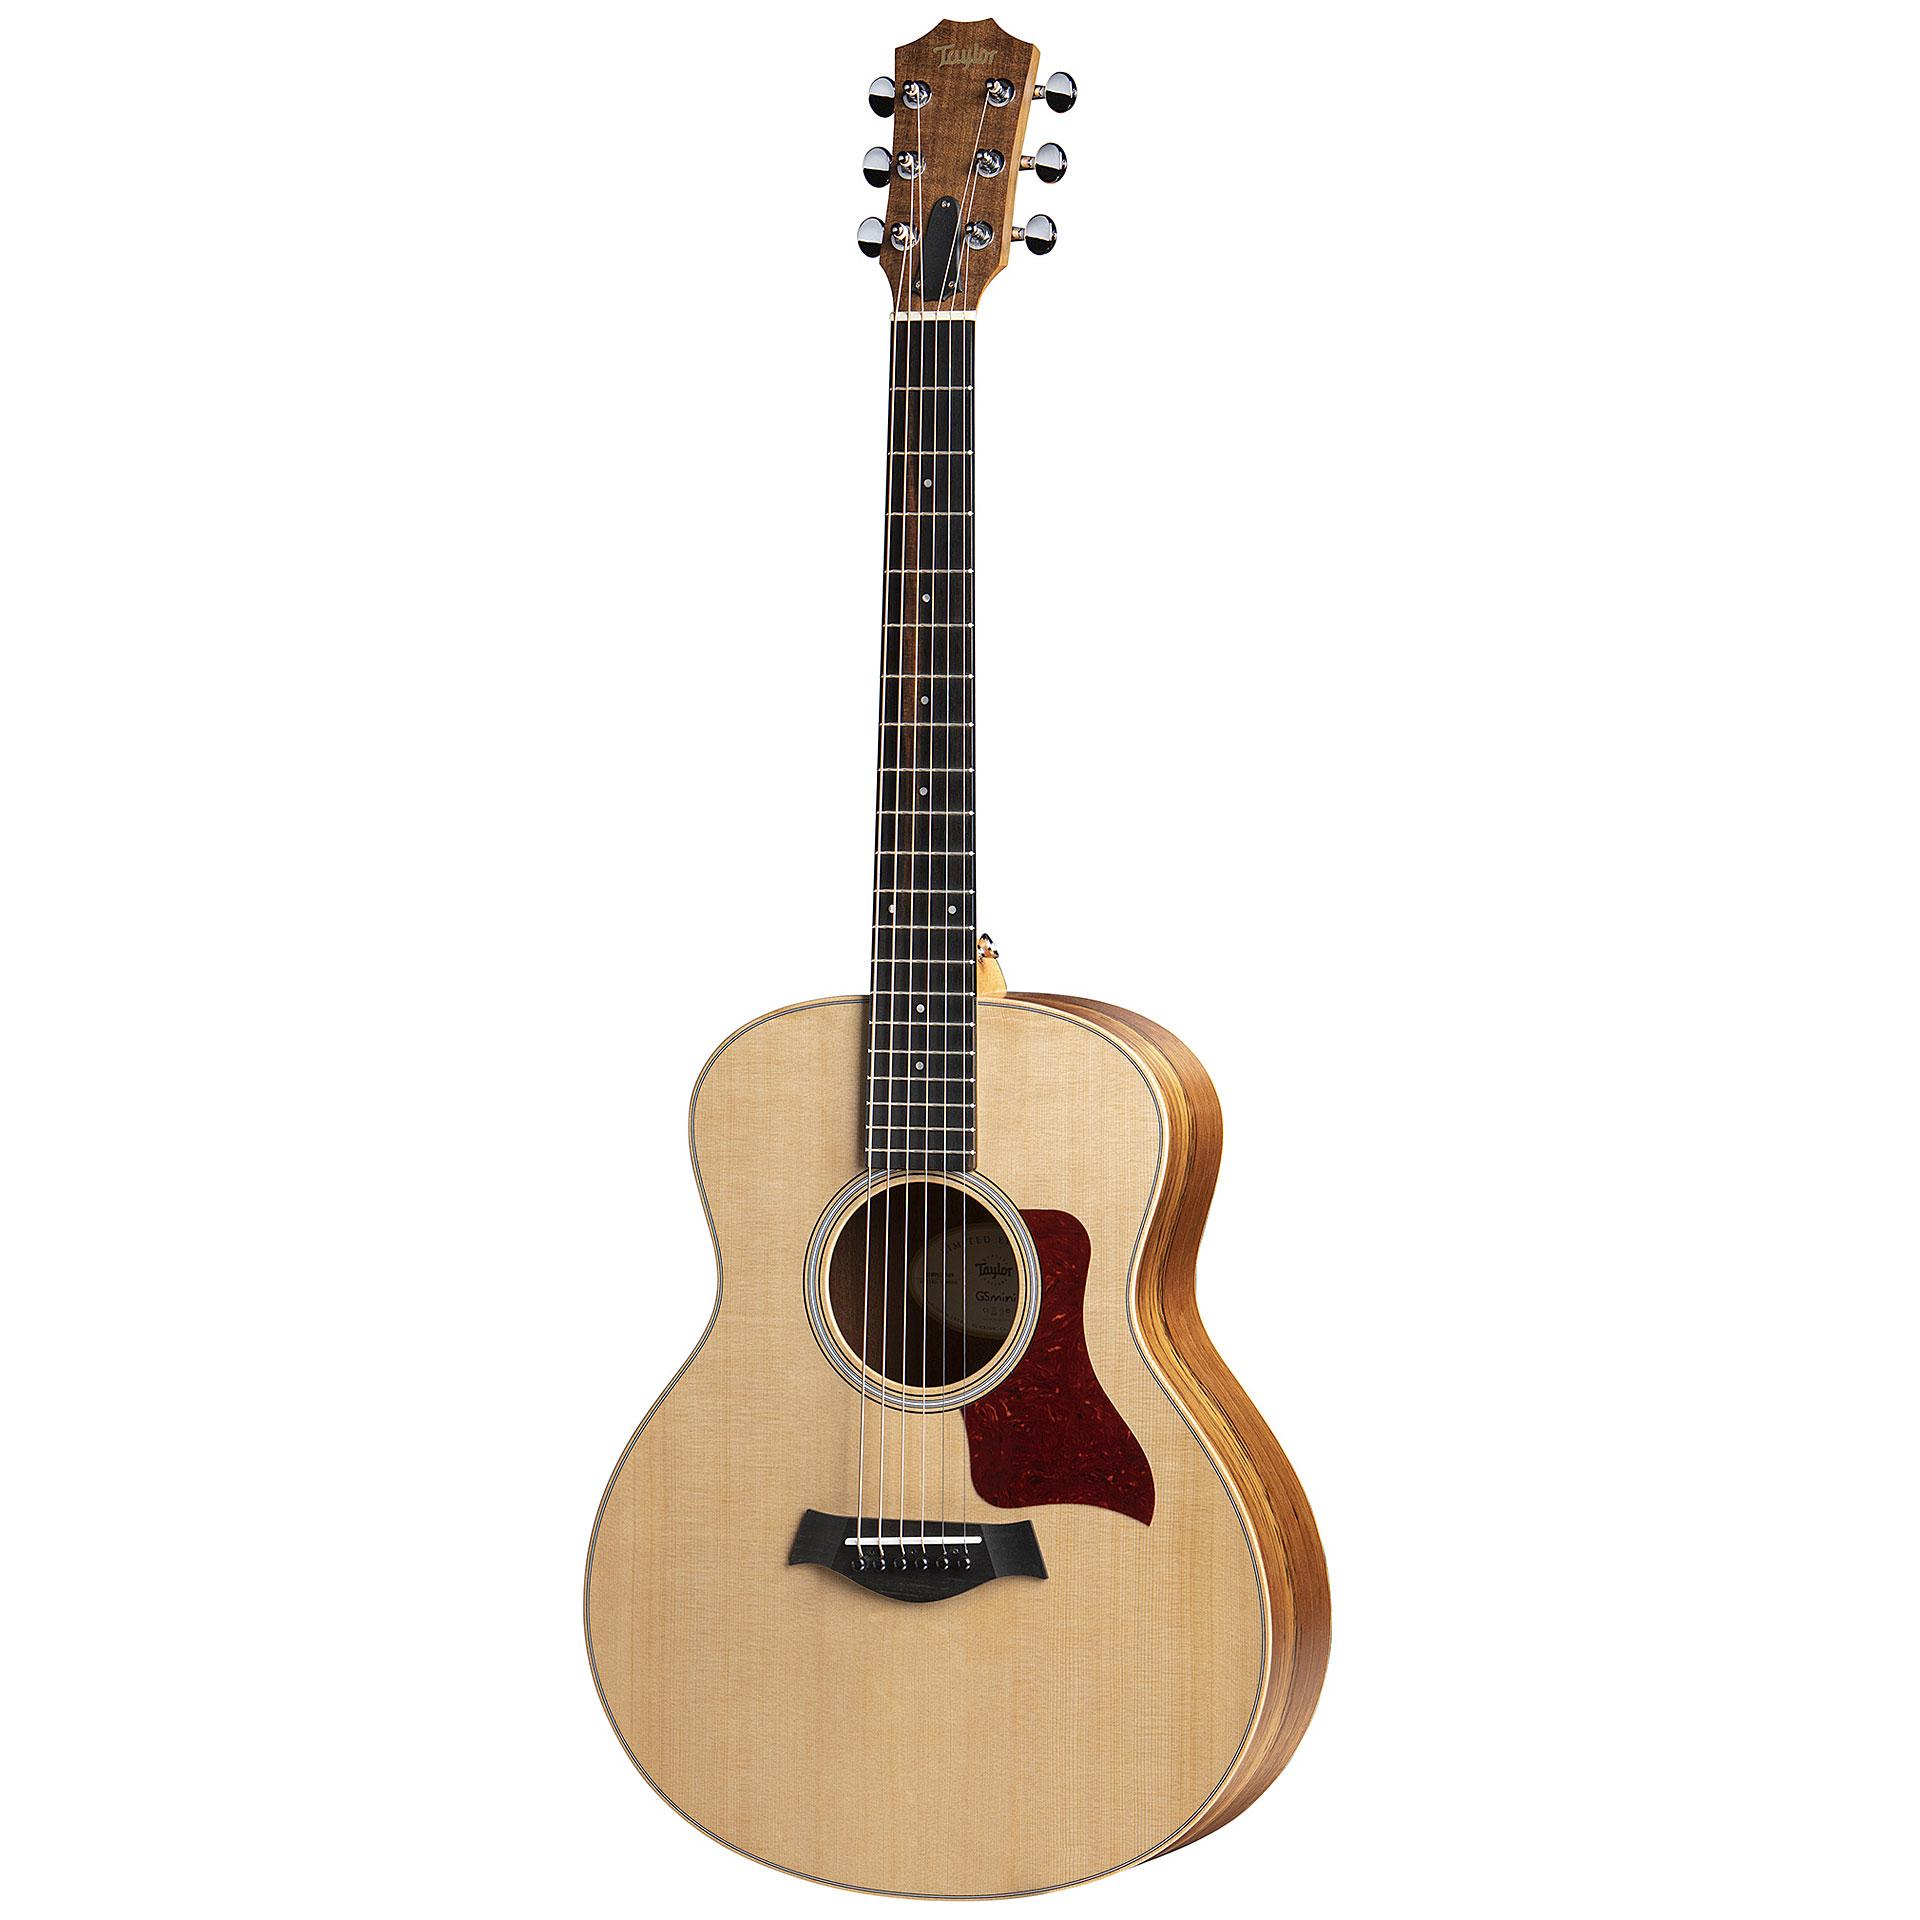 taylor gs mini e ltd ovangkol acoustic guitar. Black Bedroom Furniture Sets. Home Design Ideas